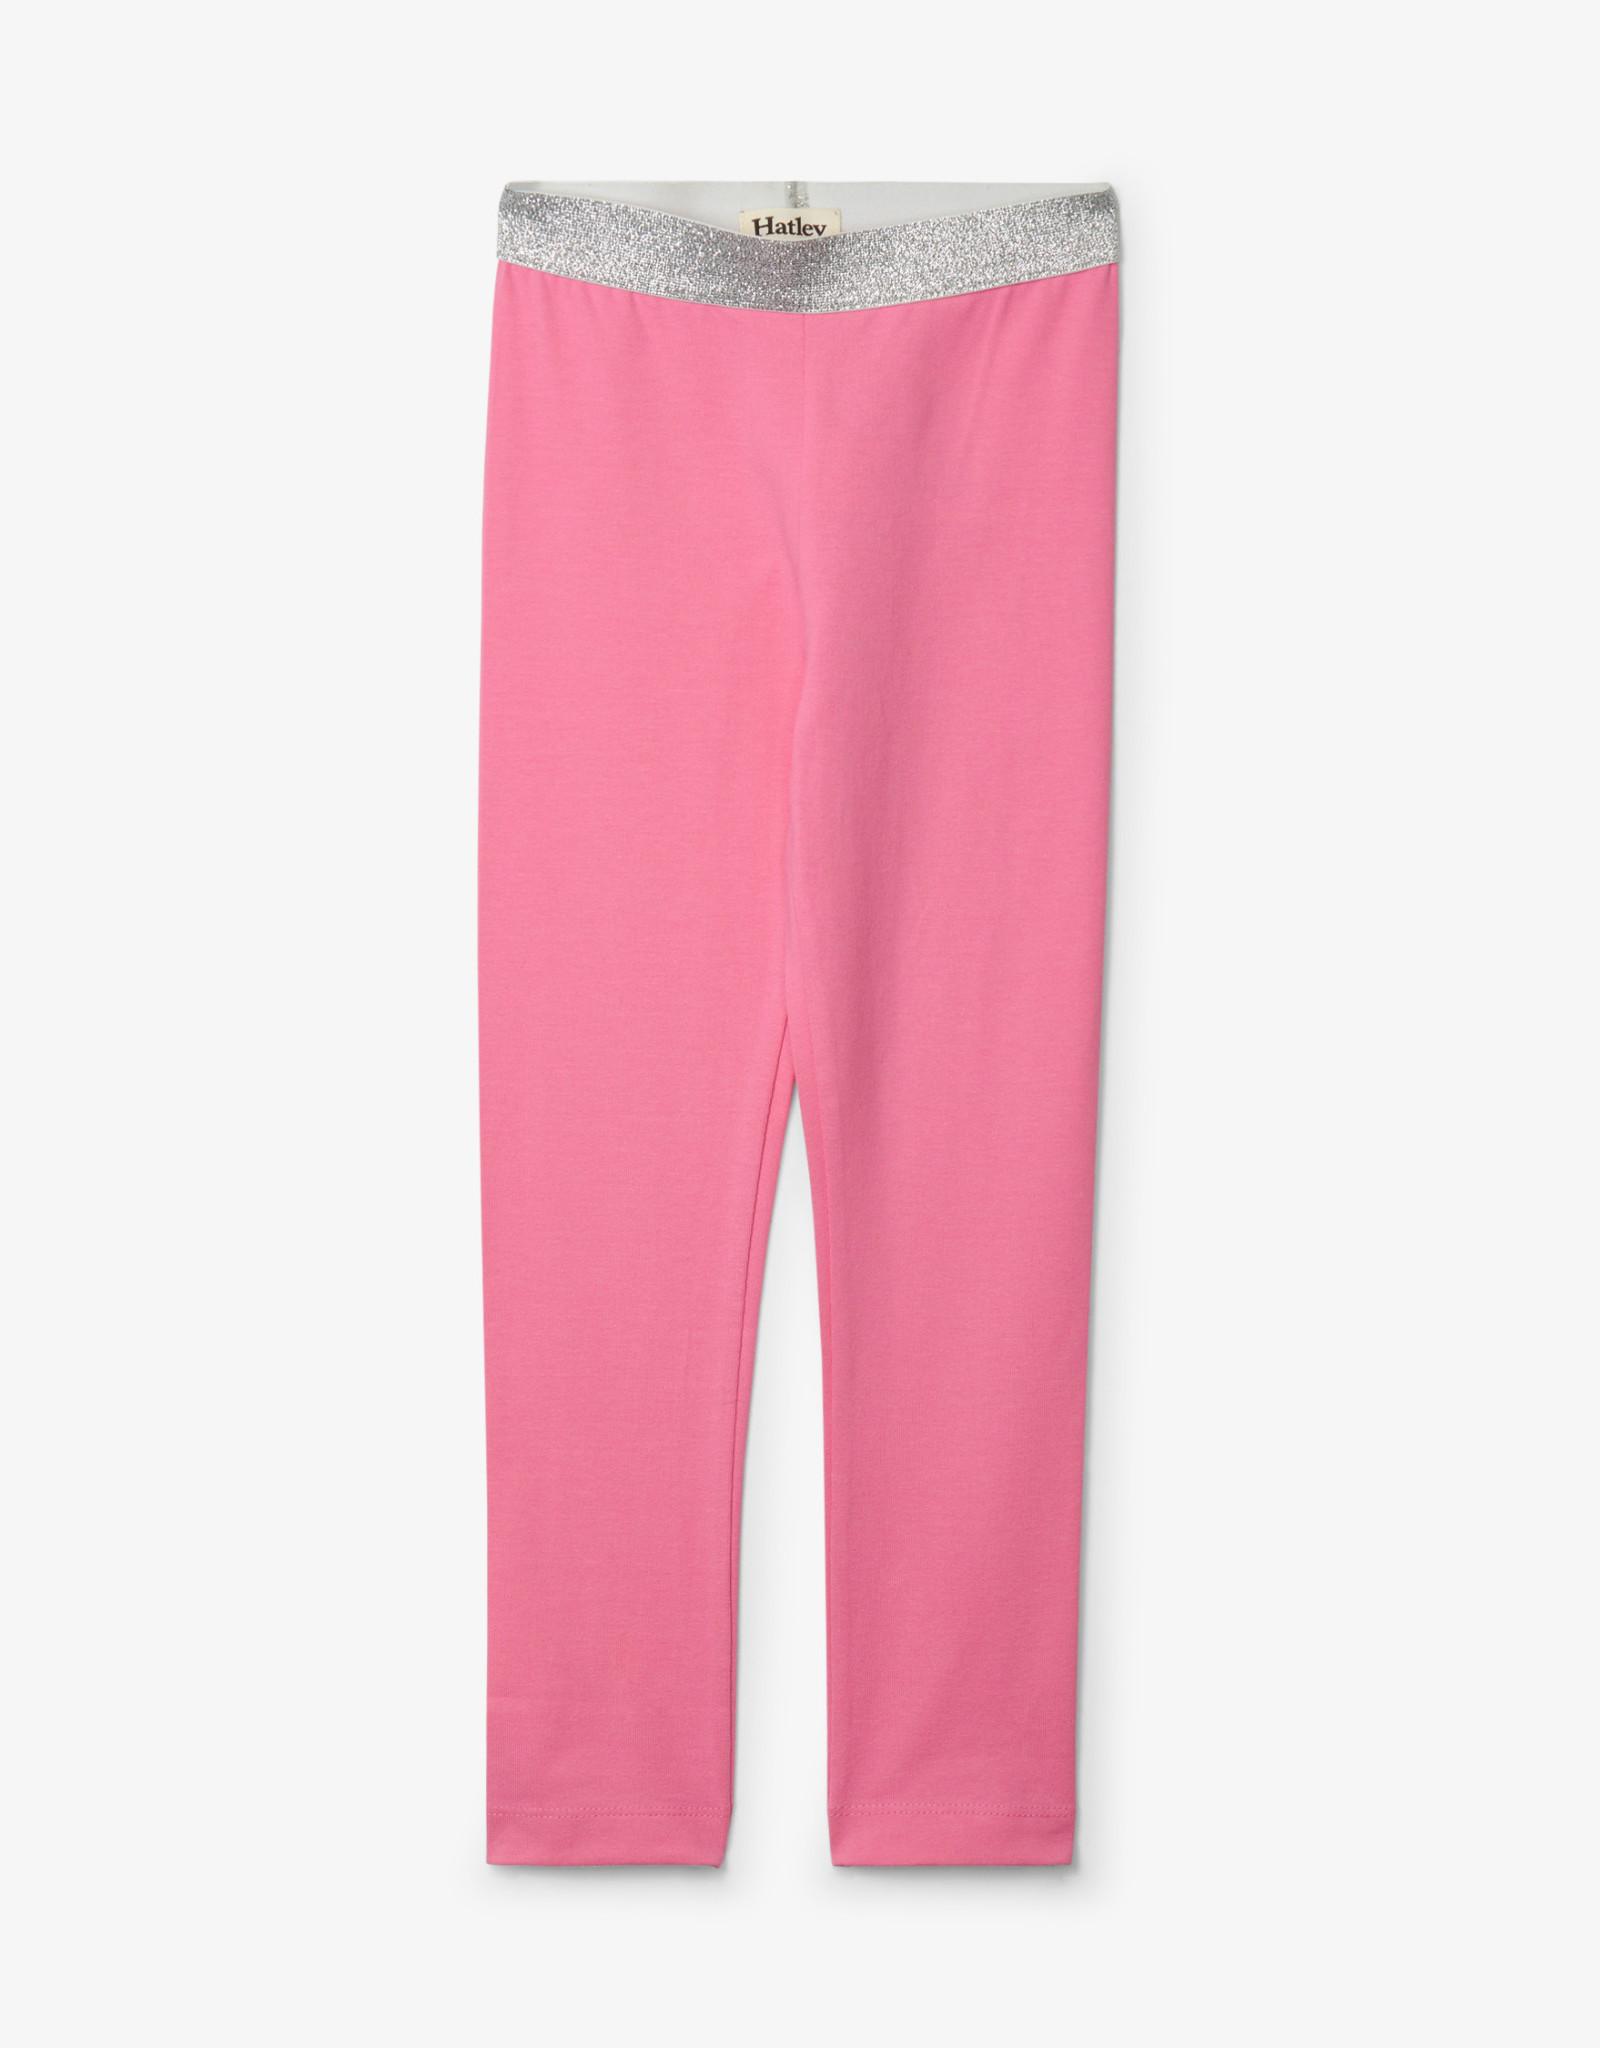 Hatley Pink Embellished Waist Leggings